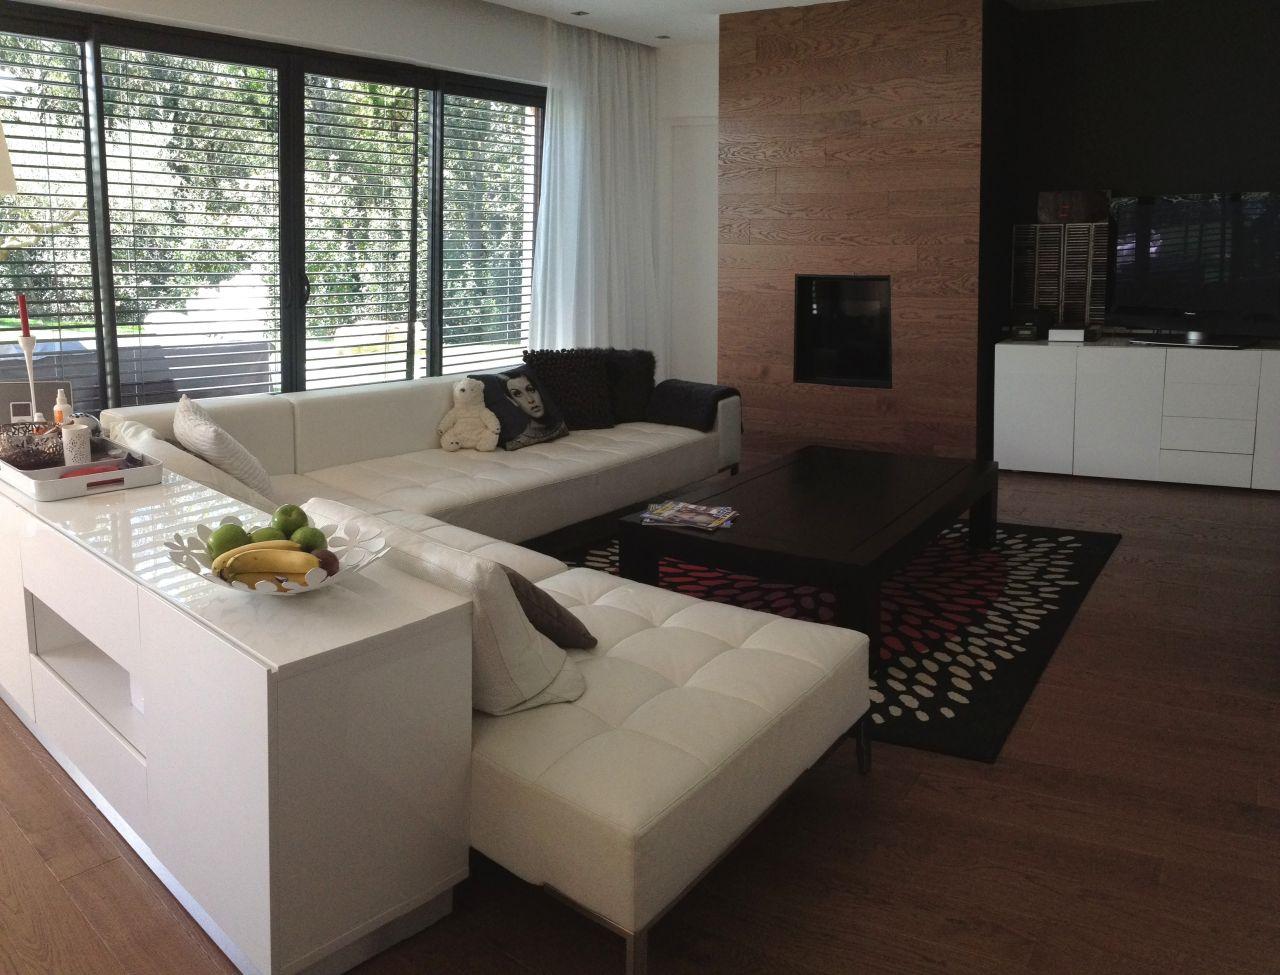 Espace parental 50m2 mobilier blanc - Gard (30) - avril 2015